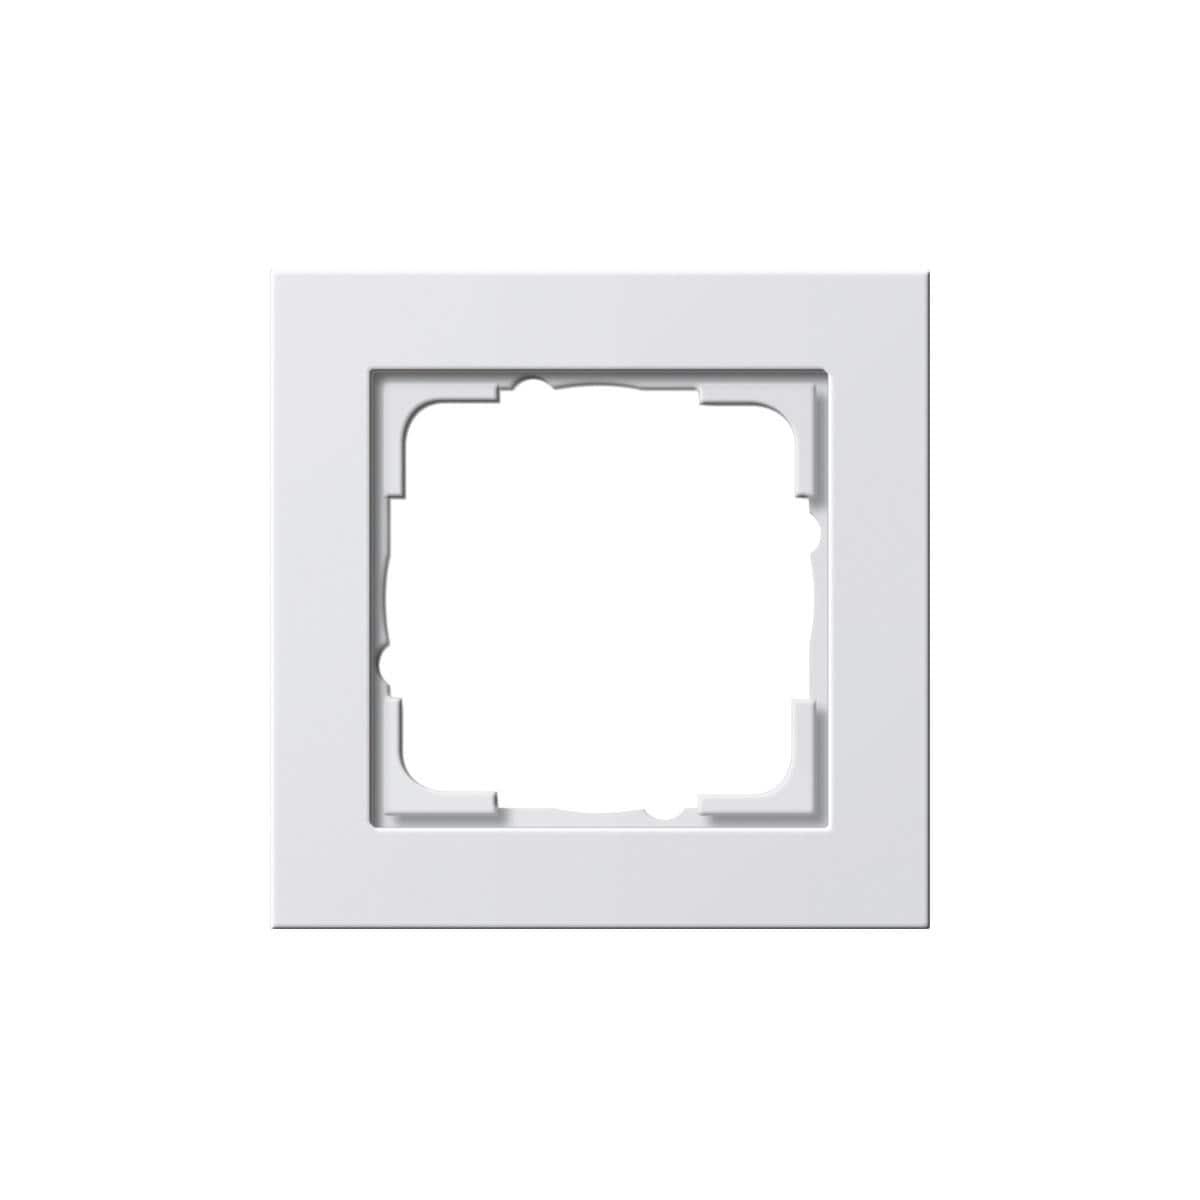 E2 Reinweiß glänzend Schalter//Steckdose//Rahmen frei wählbar GIRA System 55